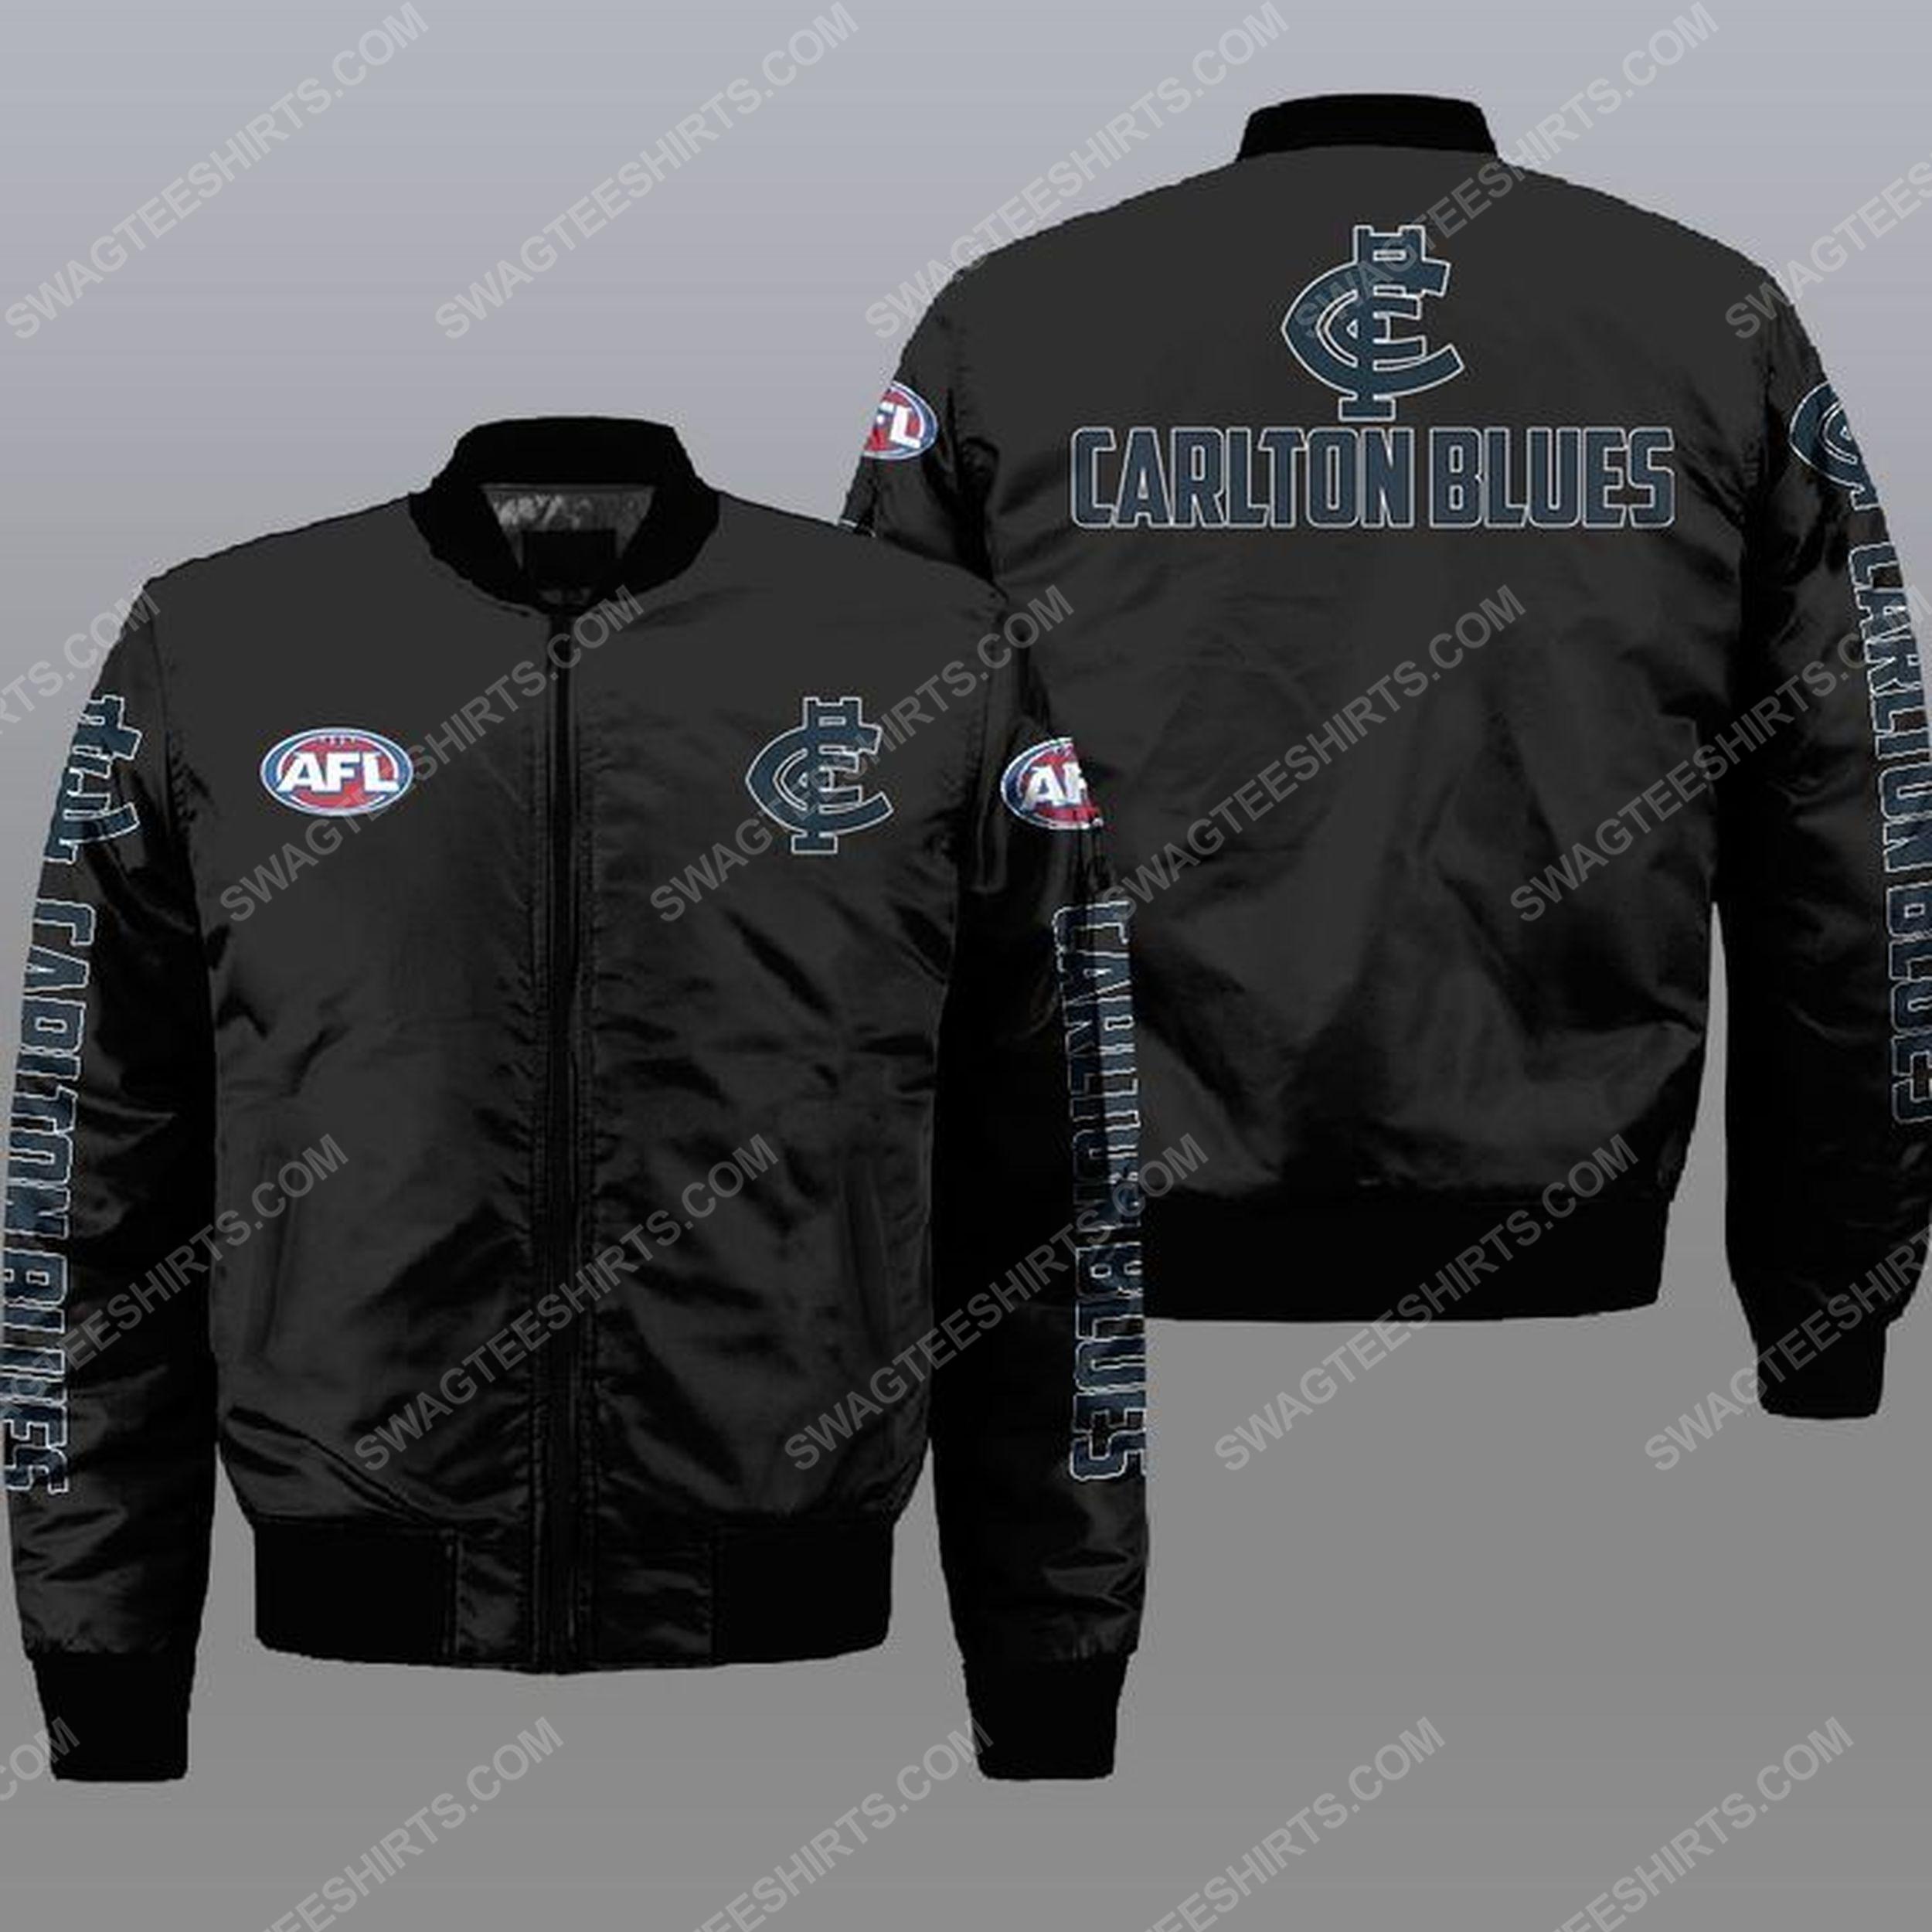 The carlton football club all over print bomber jacket - black 1